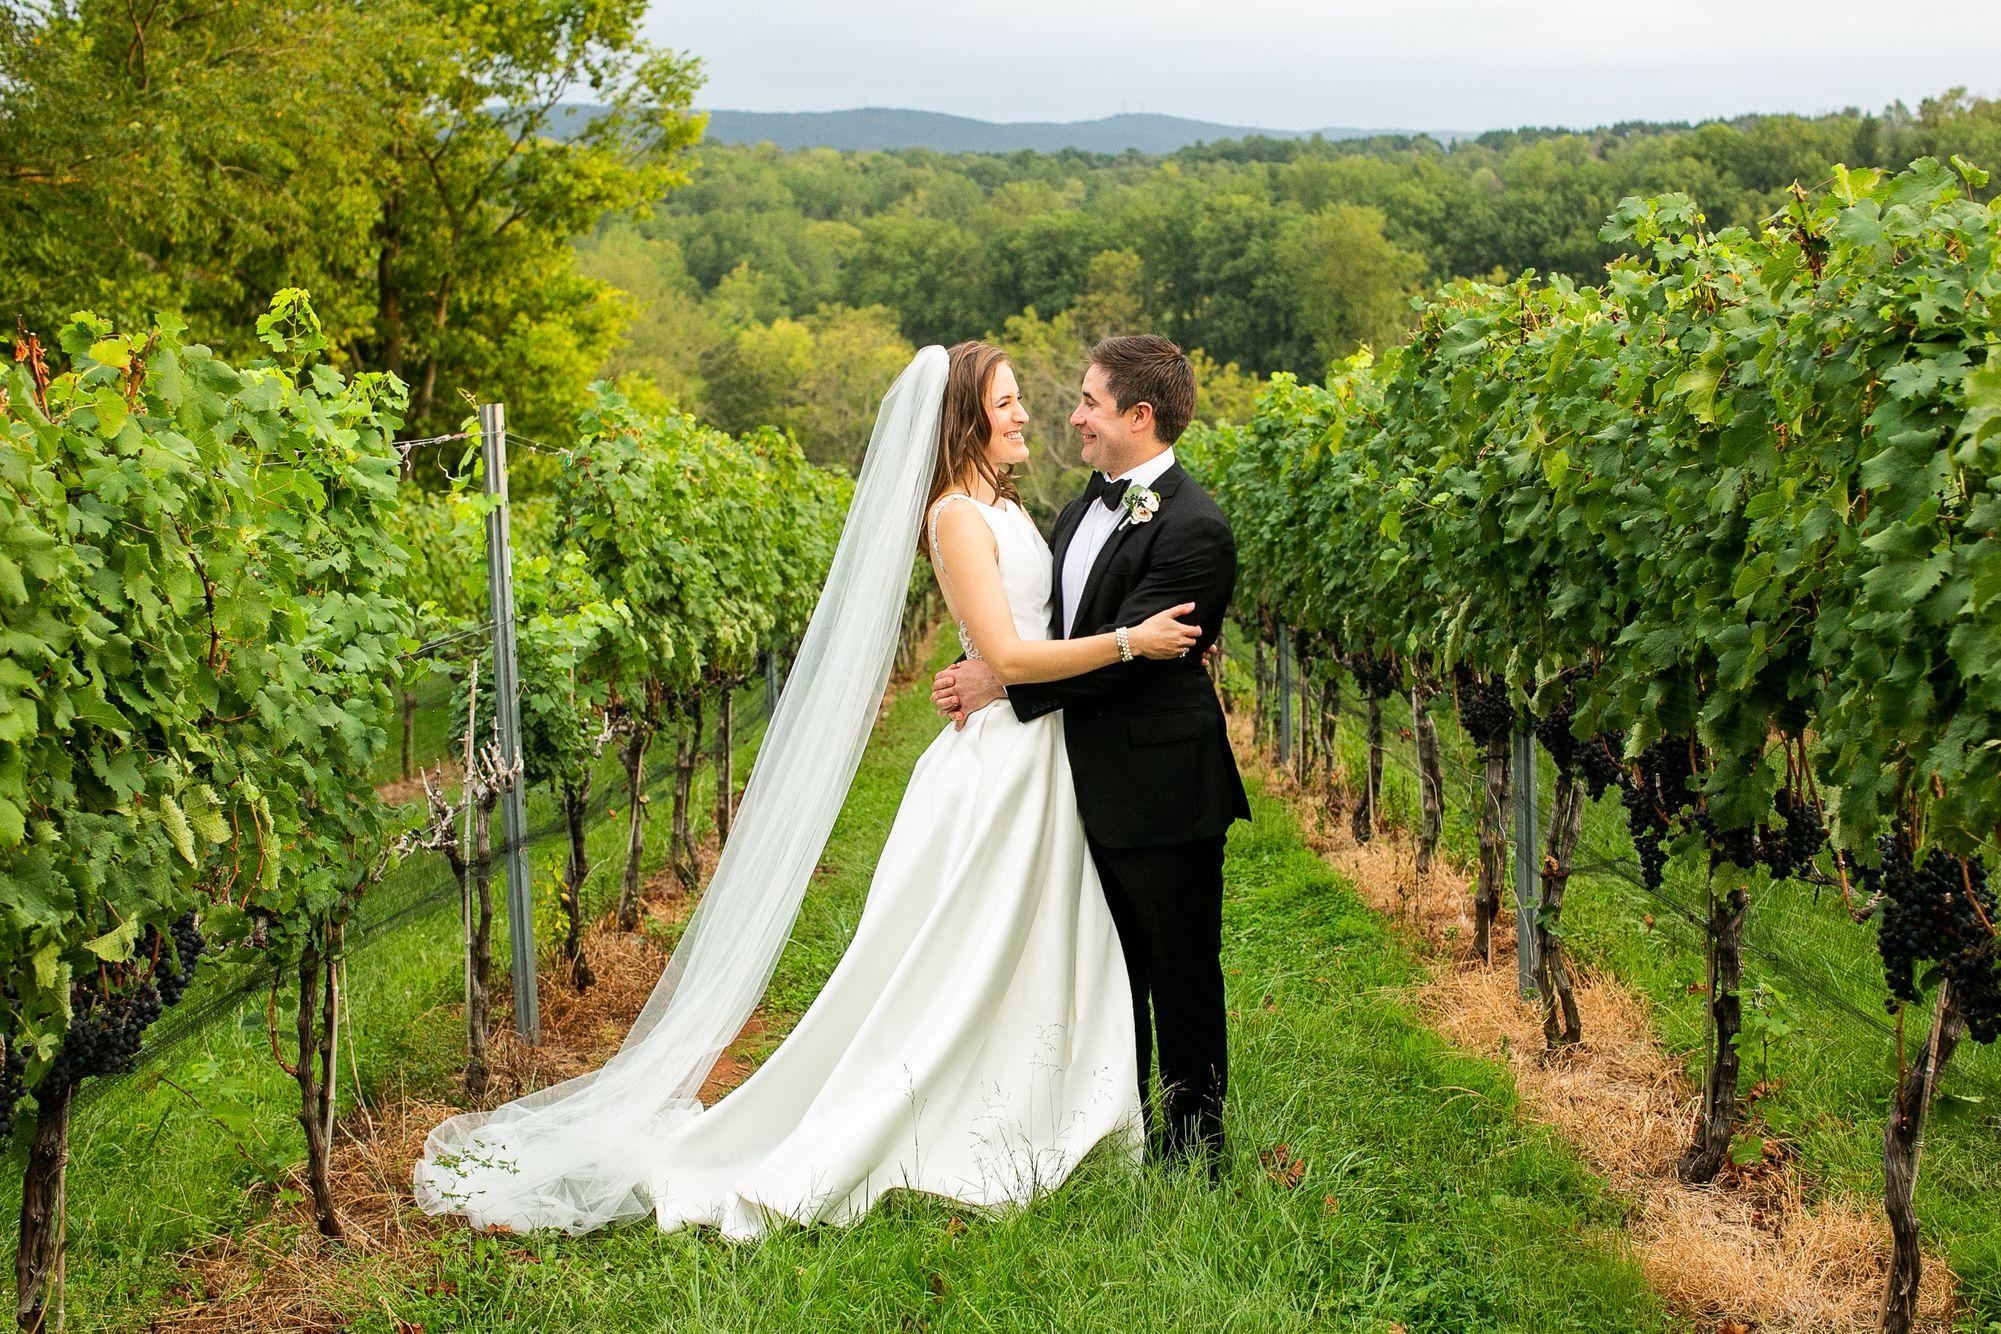 Betsy-&-Jonathan-Cana-Vineyards-Wedding-Highlights(11of15).jpg